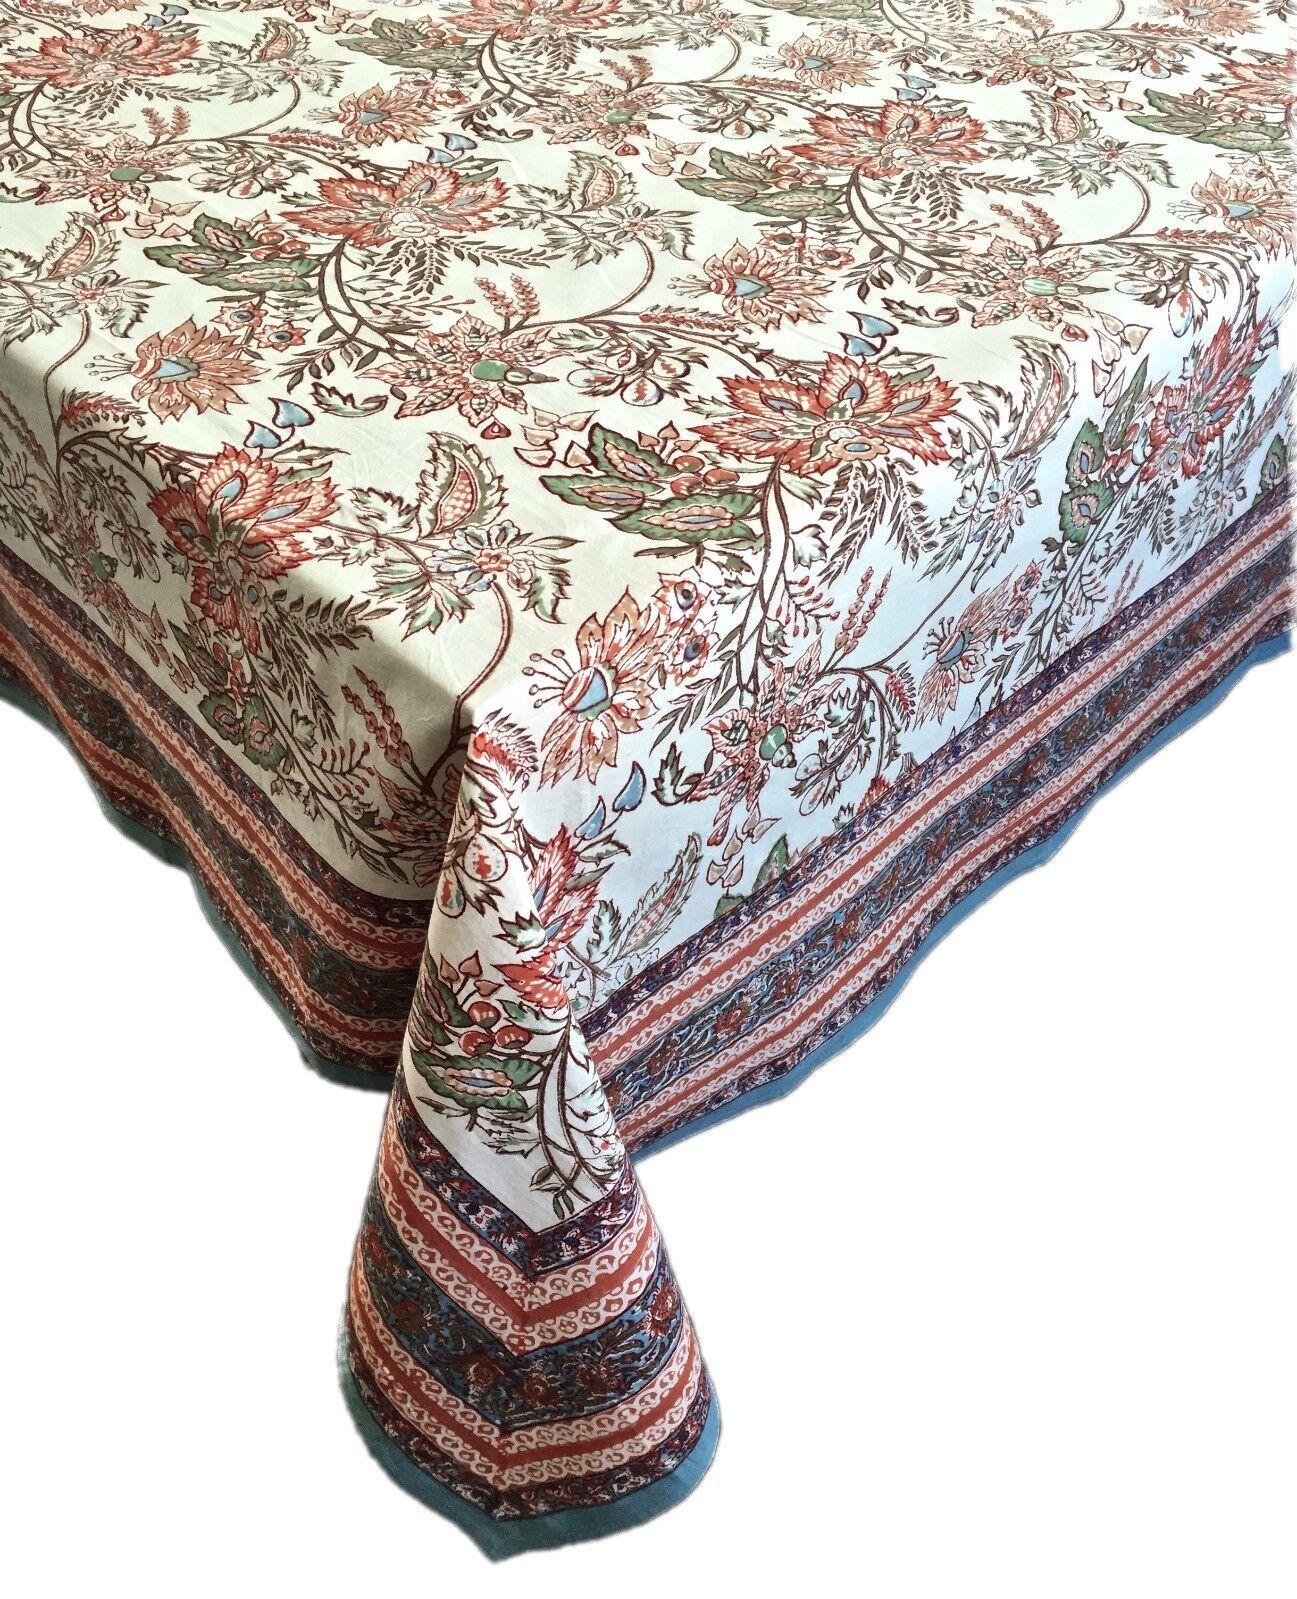 Anokhi 70 x108  Soft blanc Multi-Couleur Floral Rectangular Cotton Tablecloth